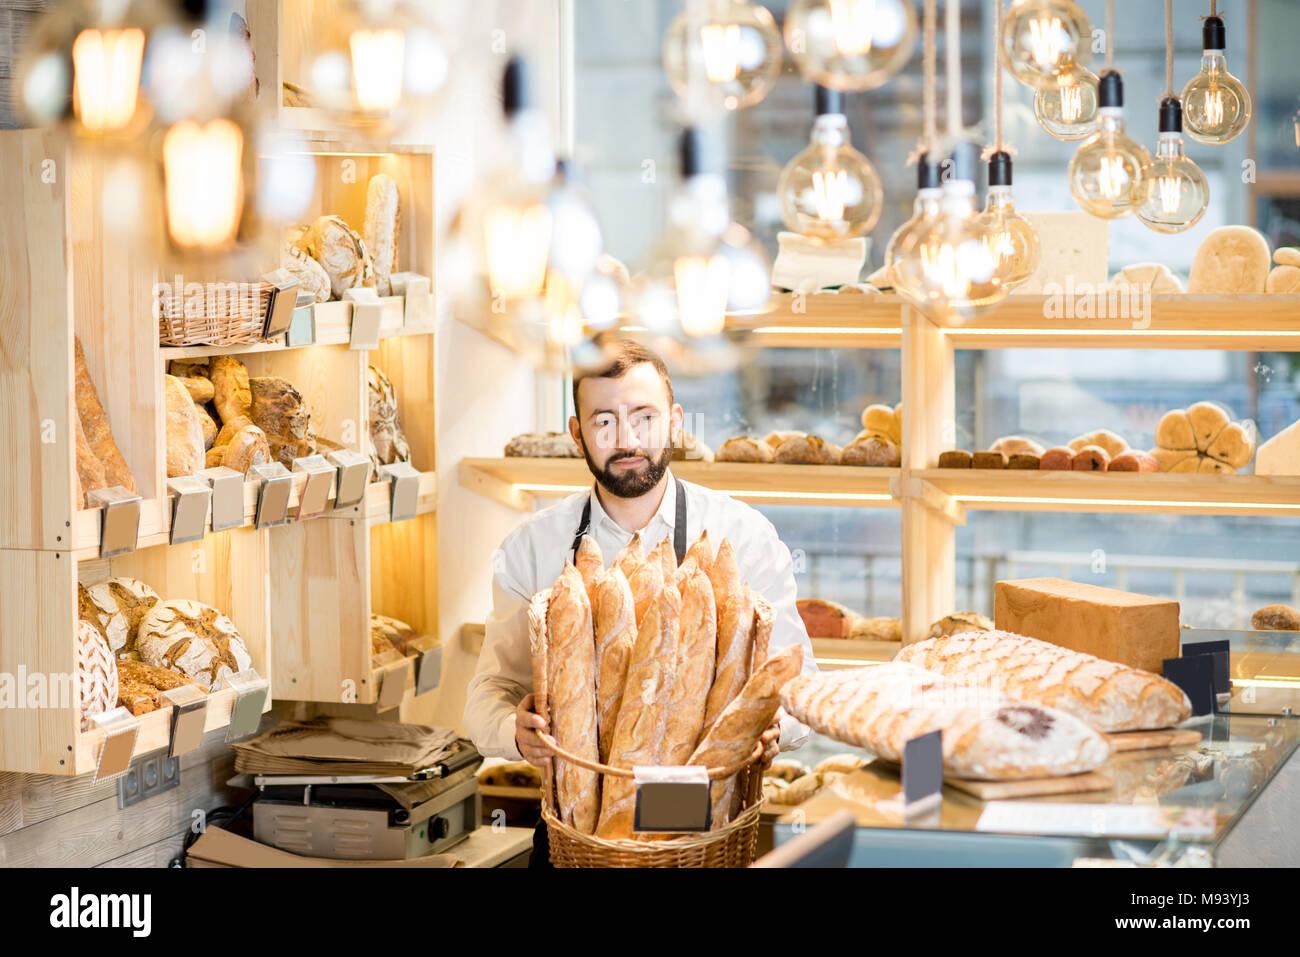 Verkäufer im Brot speichern Stockfoto